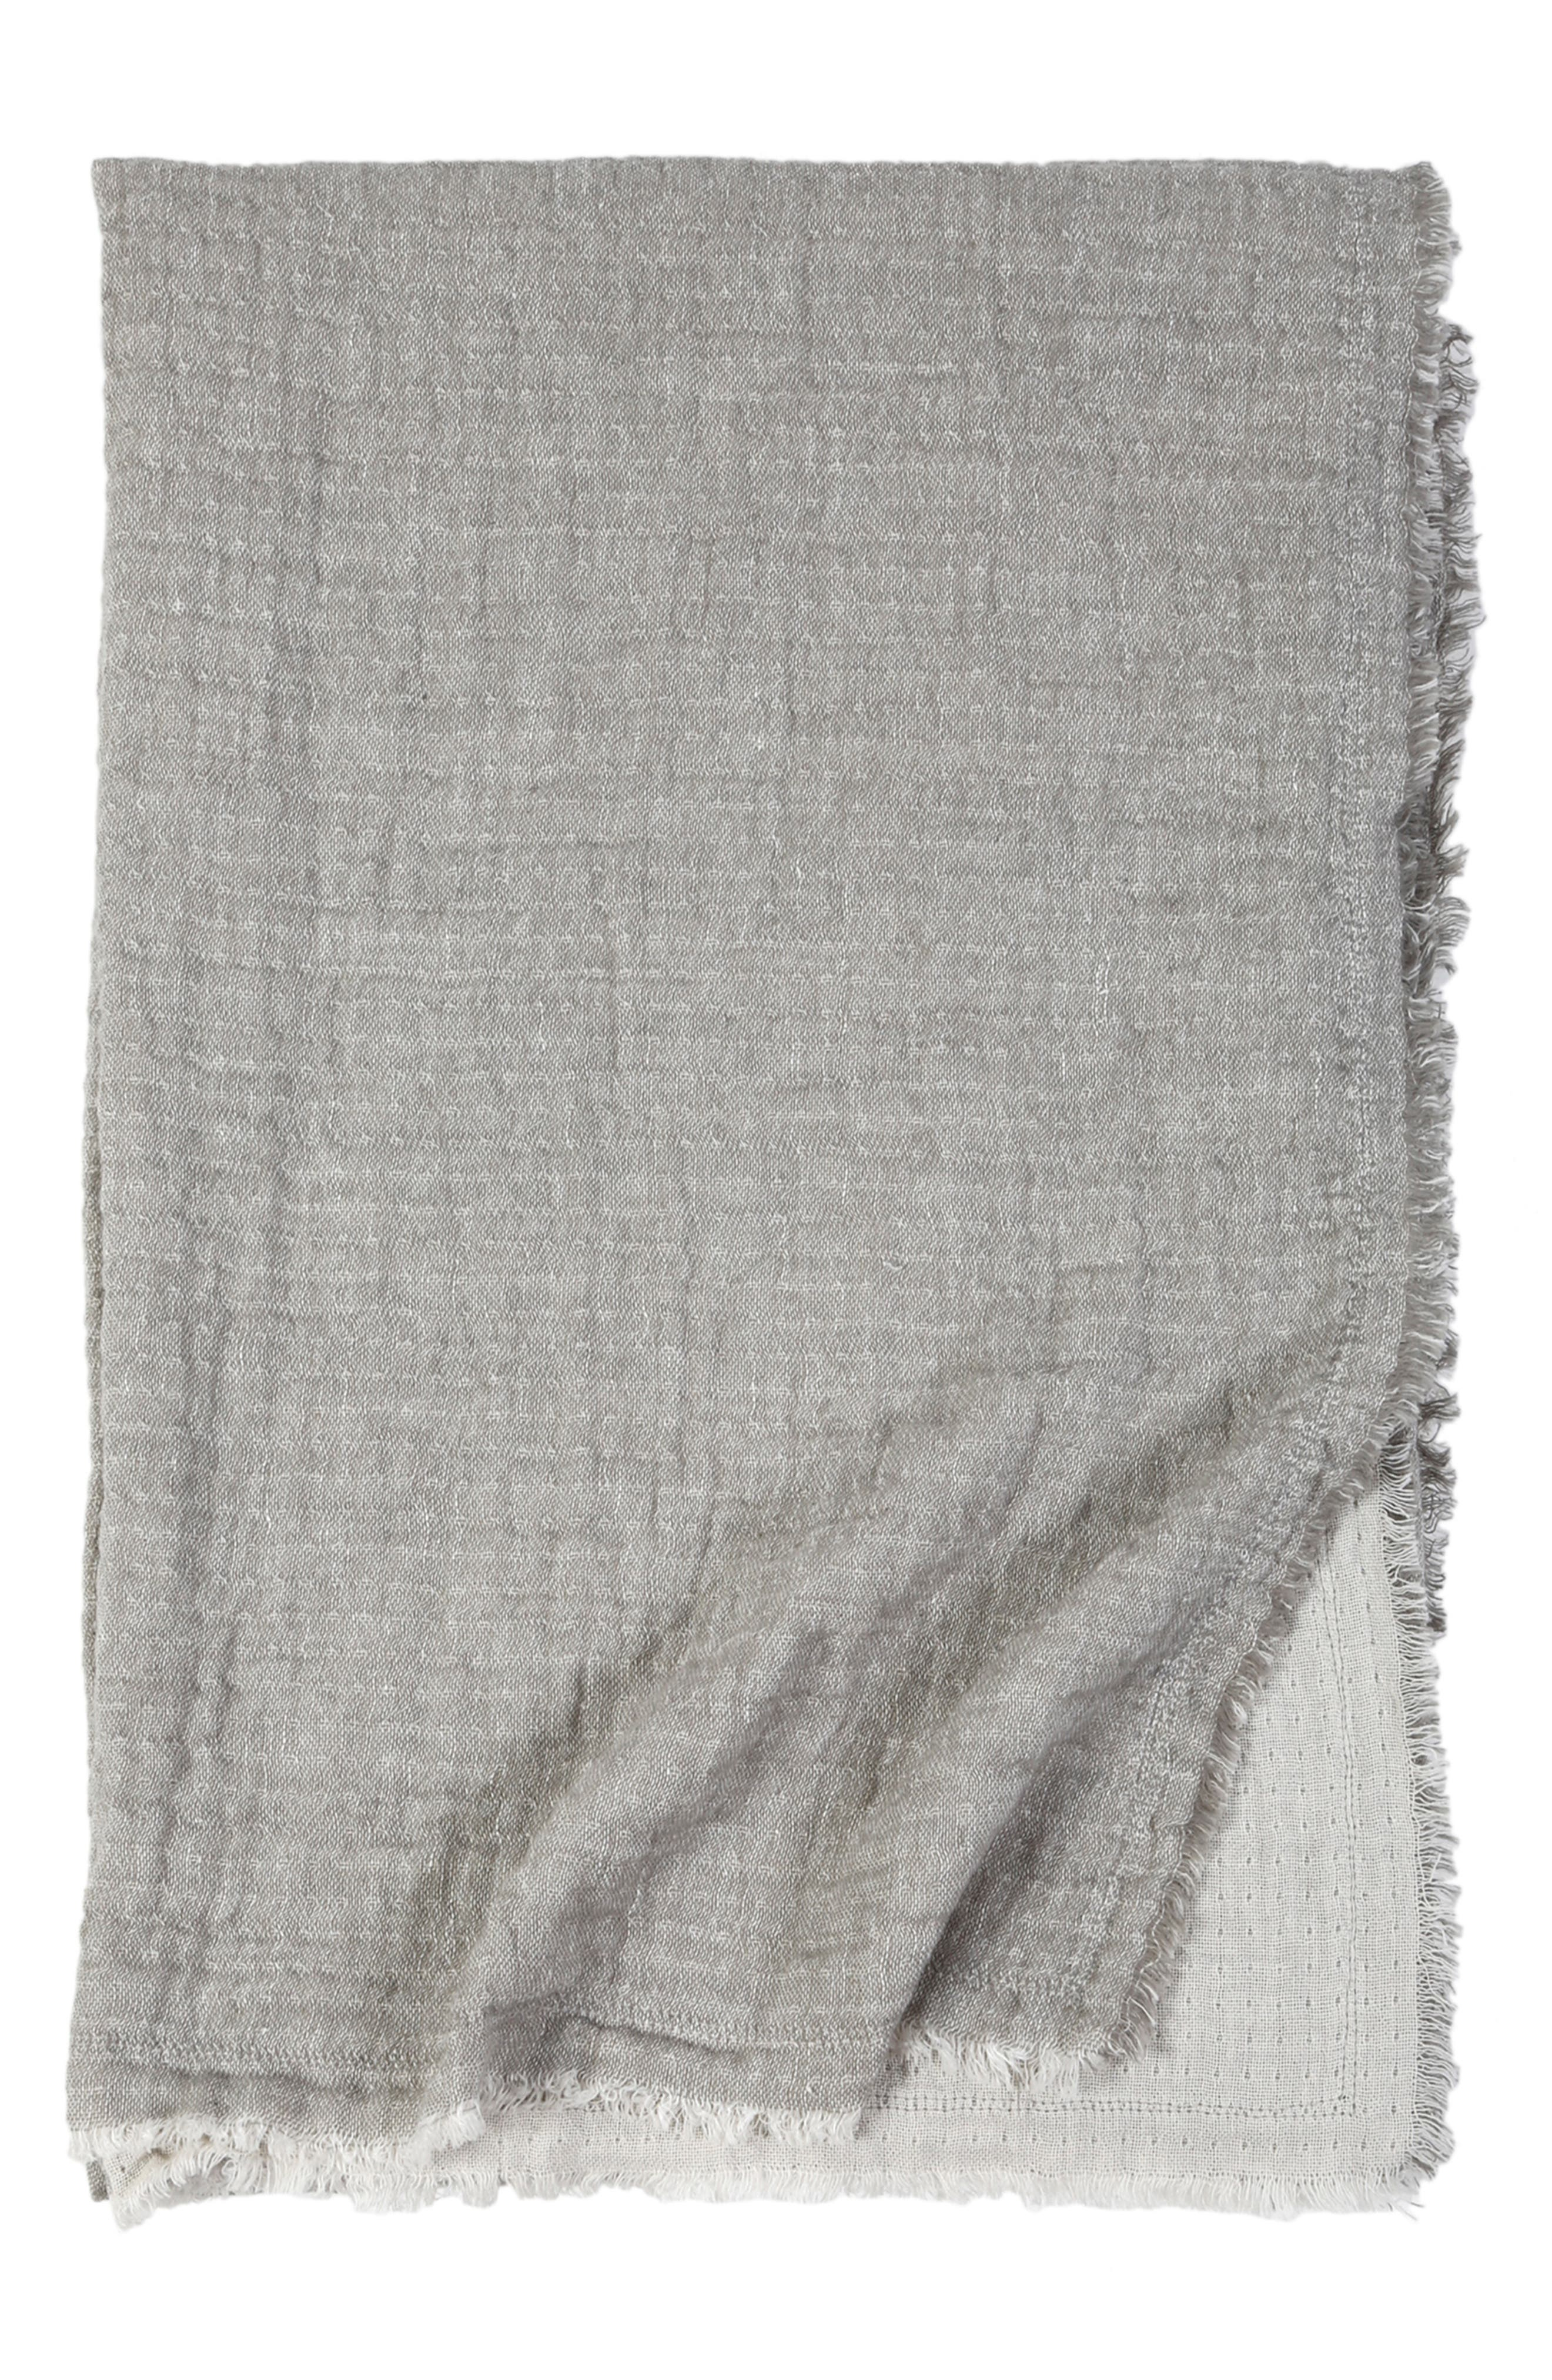 Hermosa Oversized Cotton & Linen Throw Blanket, Main, color, LIGHT GREY/ CREAM